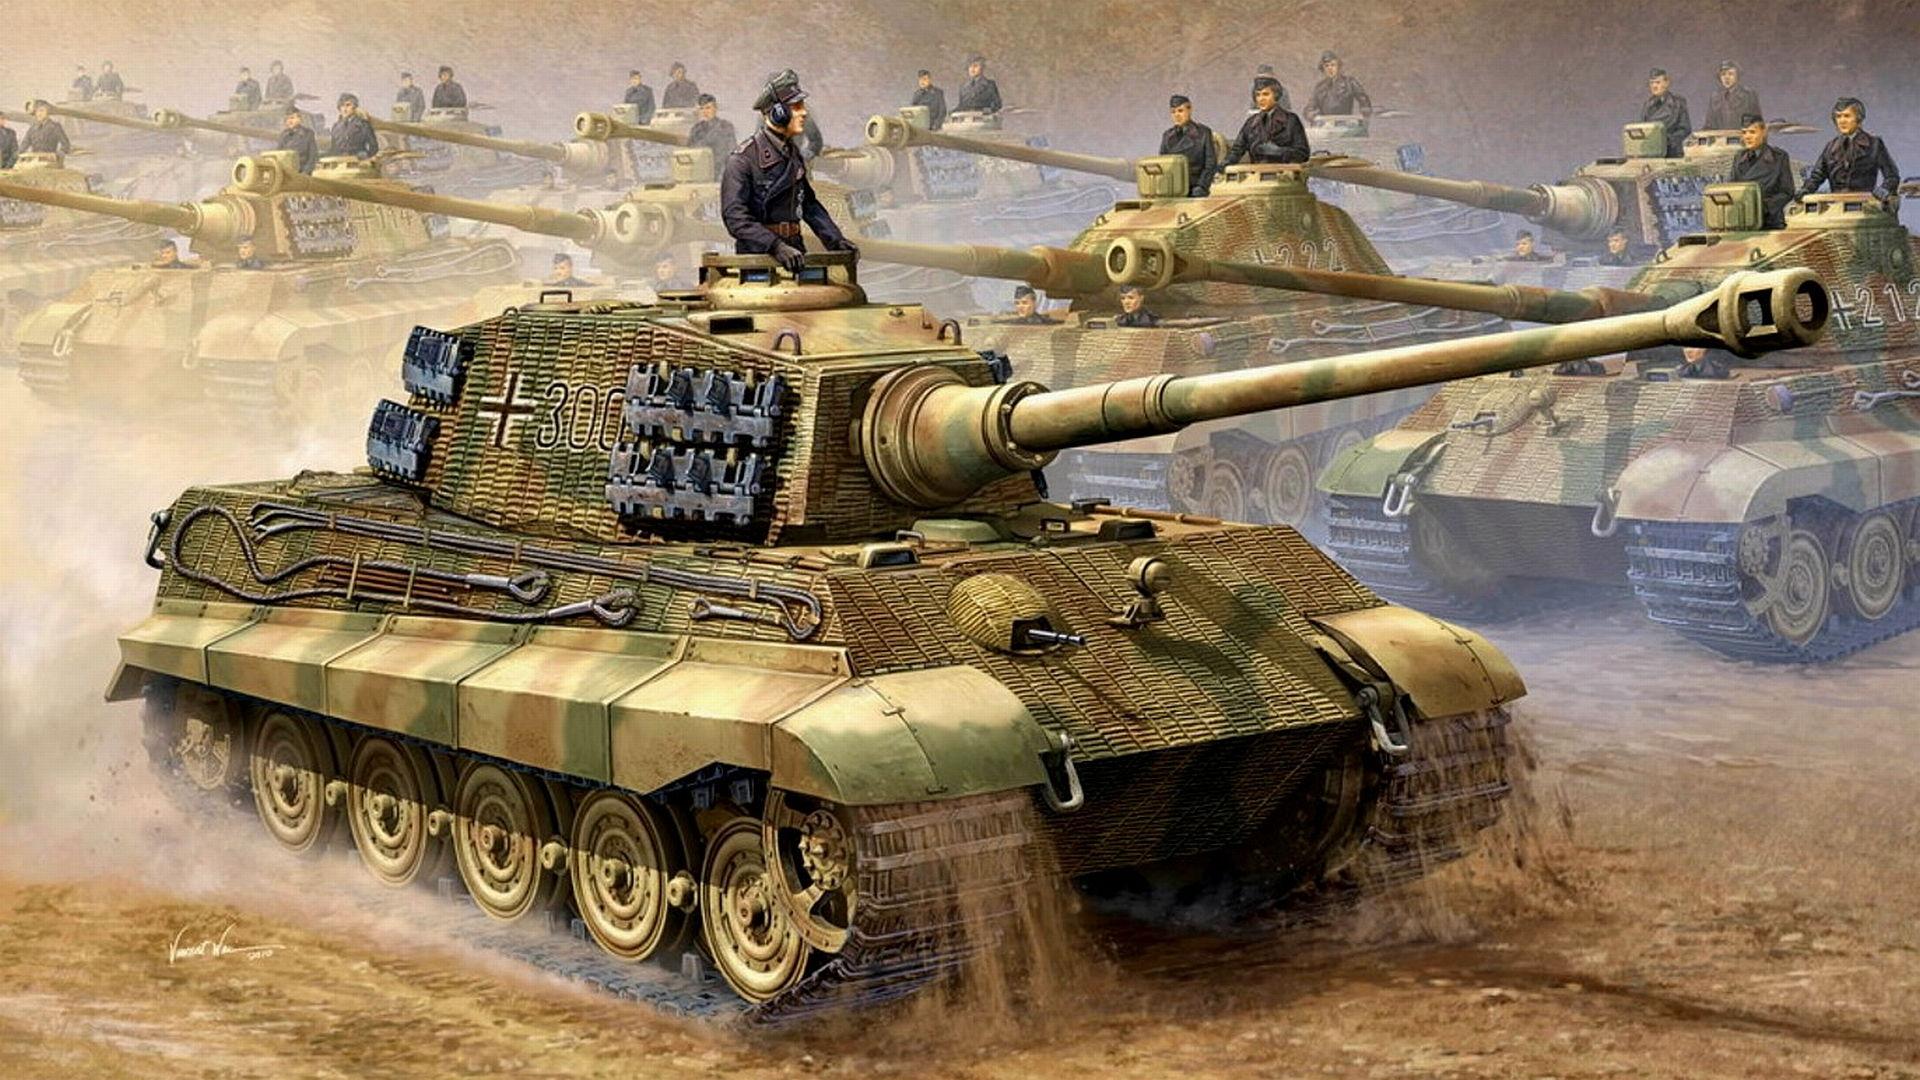 military-tanks-images-hd-1920%C3%971080-wallpaper-wp3808223